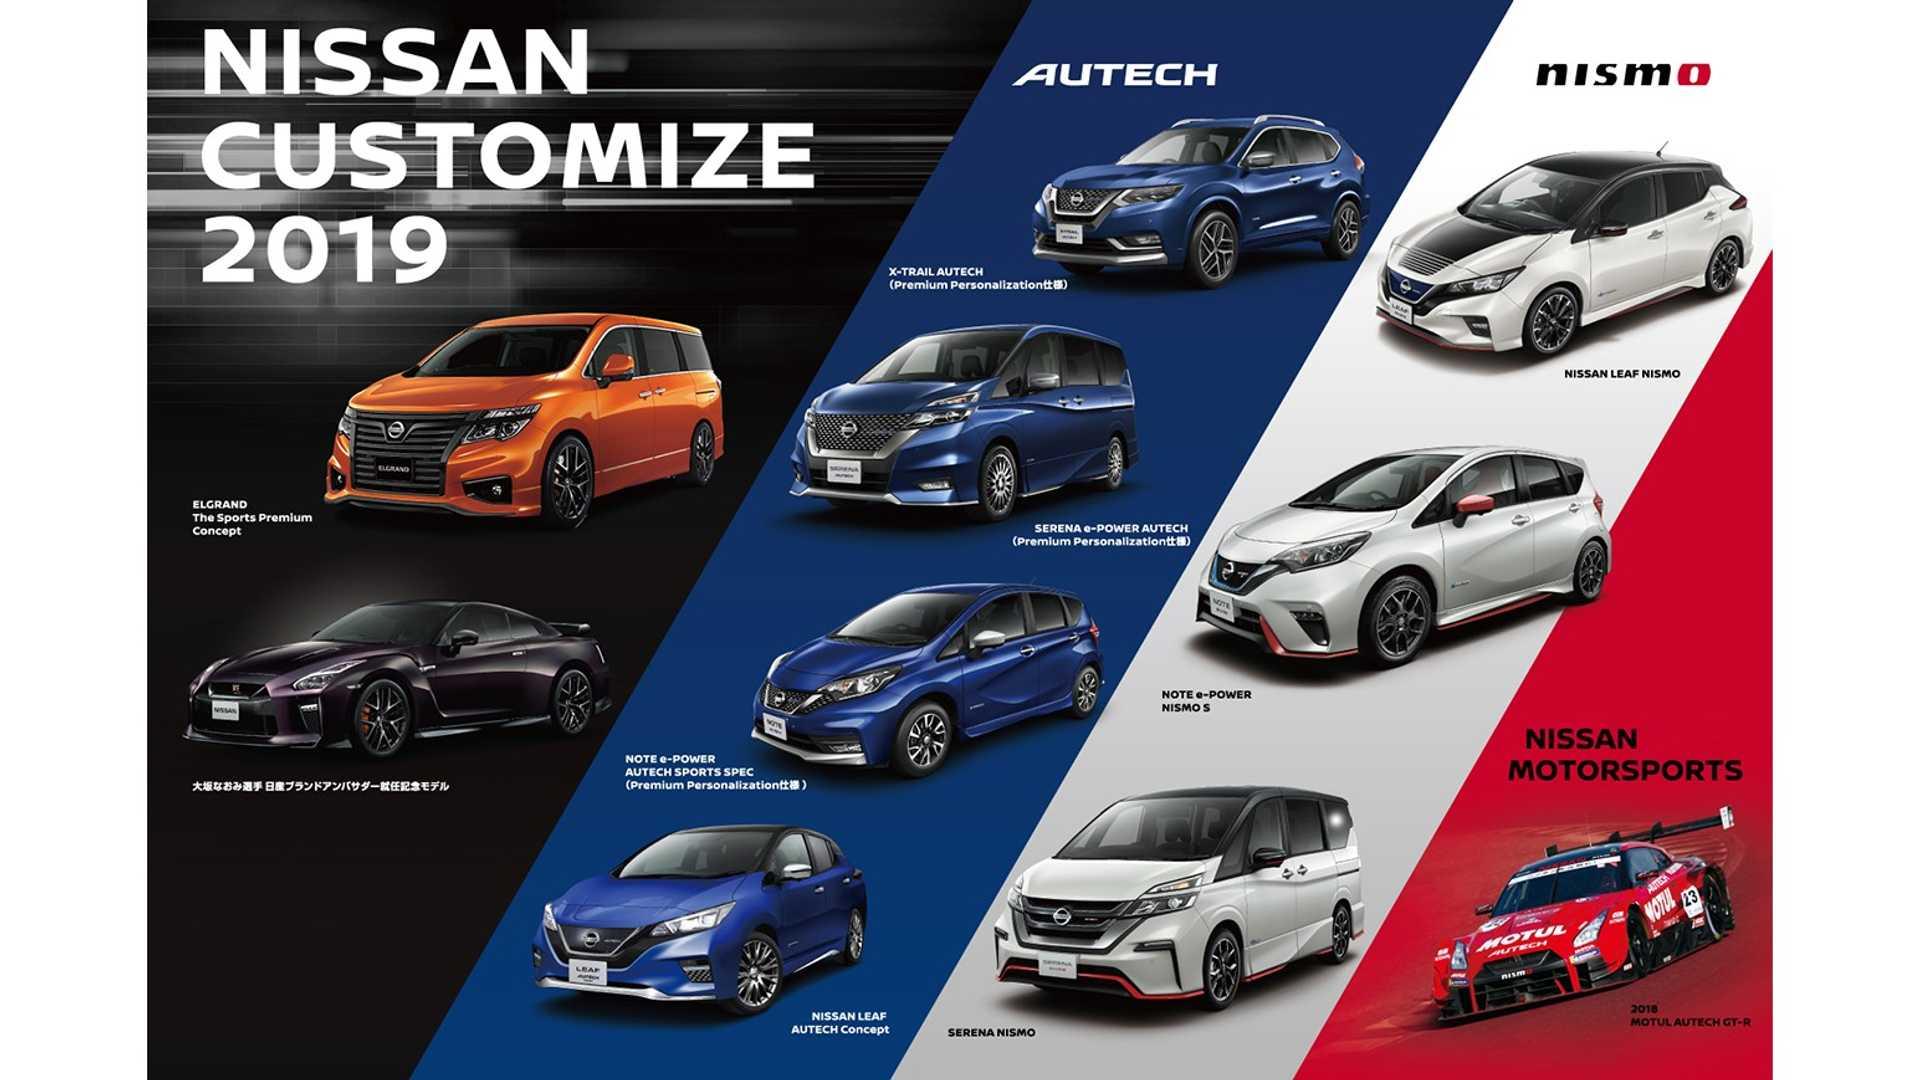 nissan-at-the-tokyo-auto-salon-2019-1 Nissan Juke Snowmobile si alte exclusivitati se indreapta spre Salonul Auto Tokyo